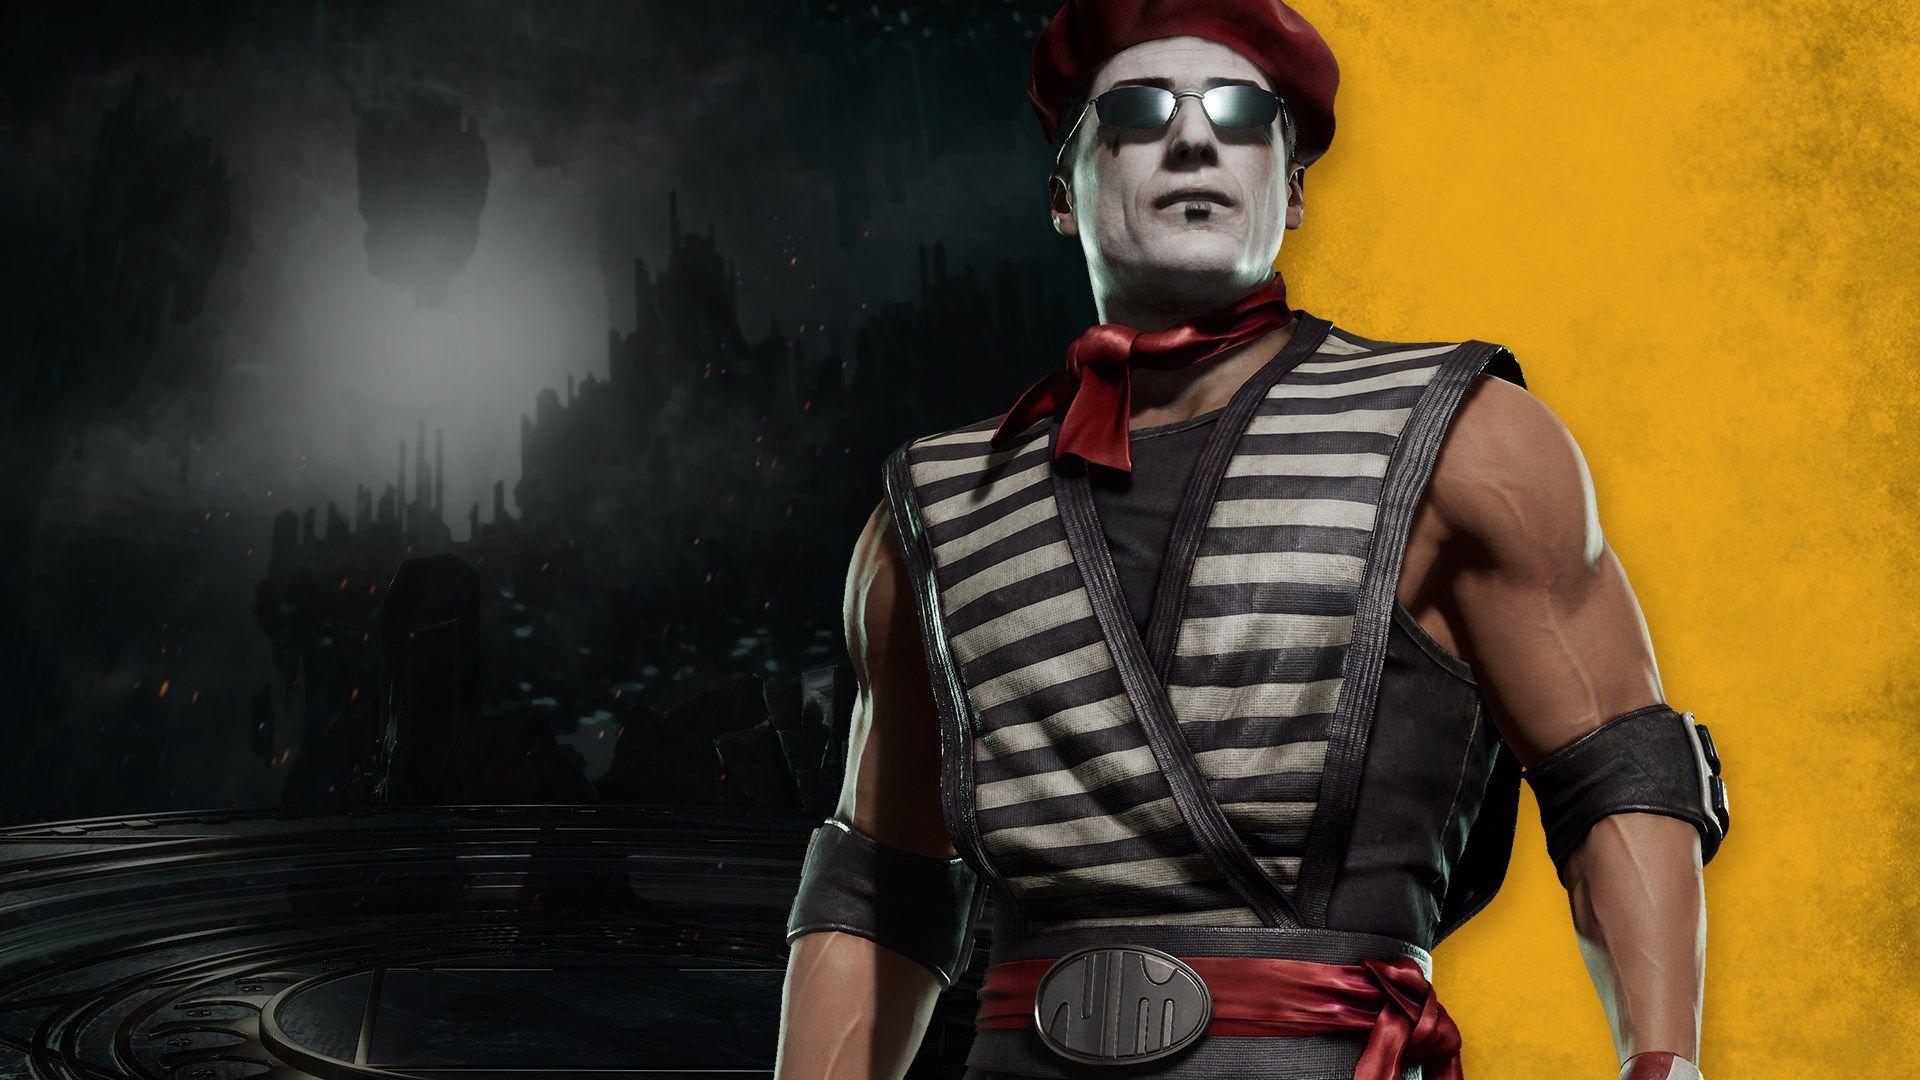 Mortal Kombat 11 Johnny Cage Wallpapers